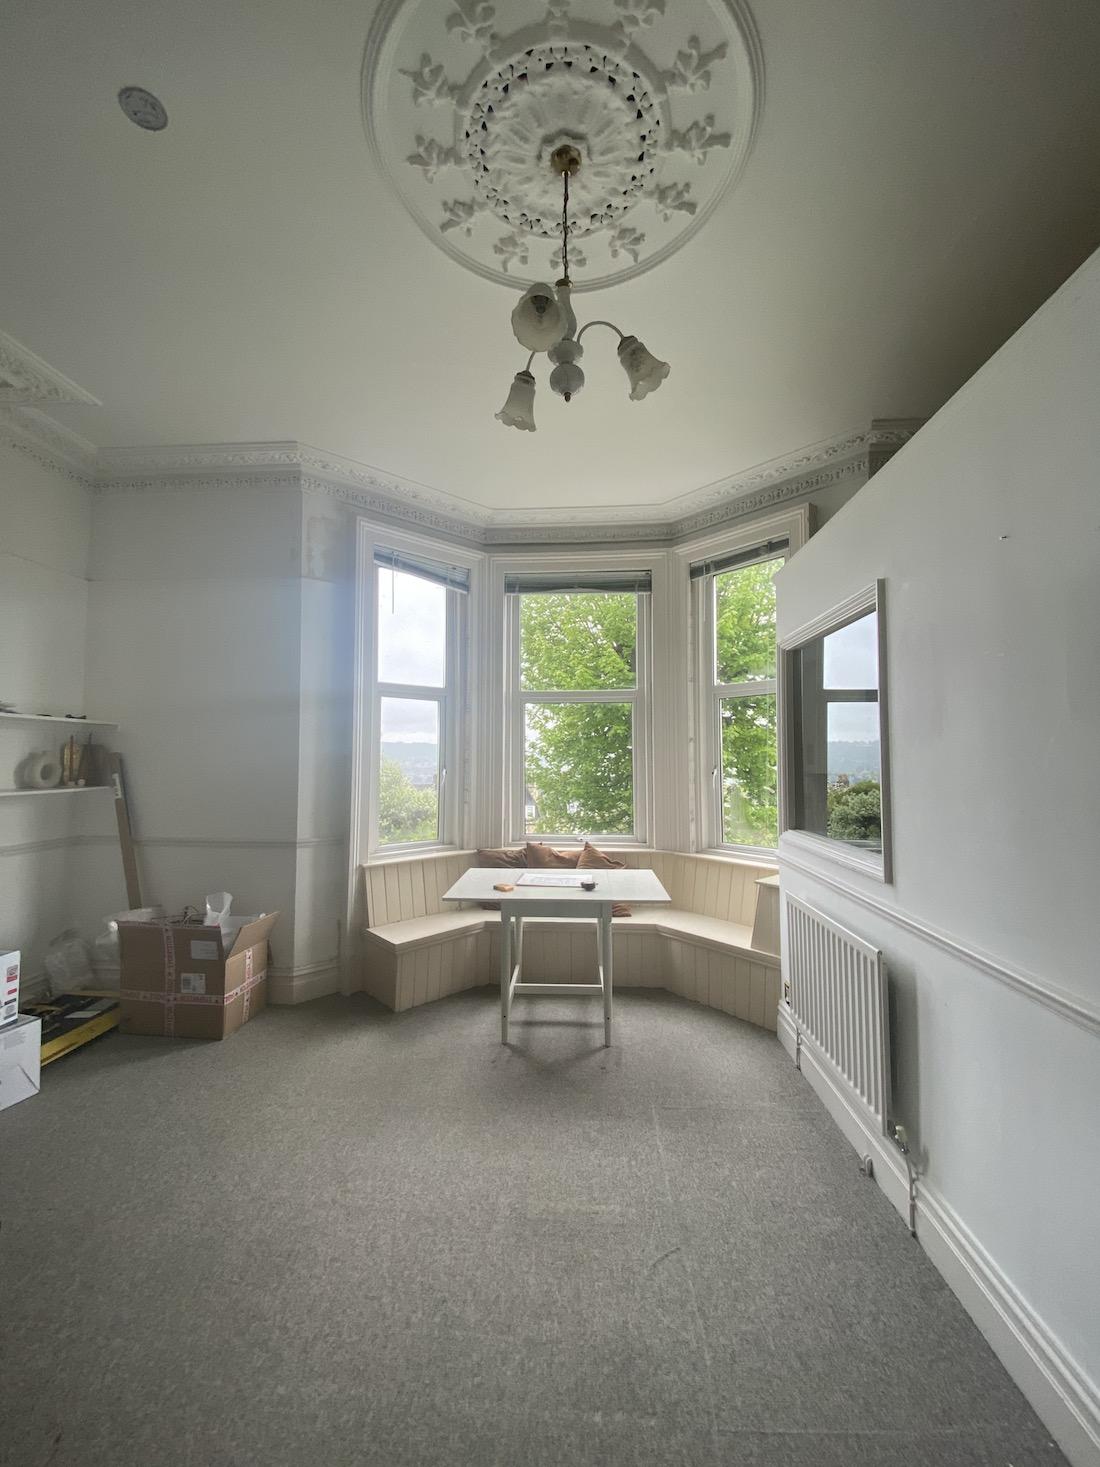 Belle Vue Georgian apartment living room before the renovation